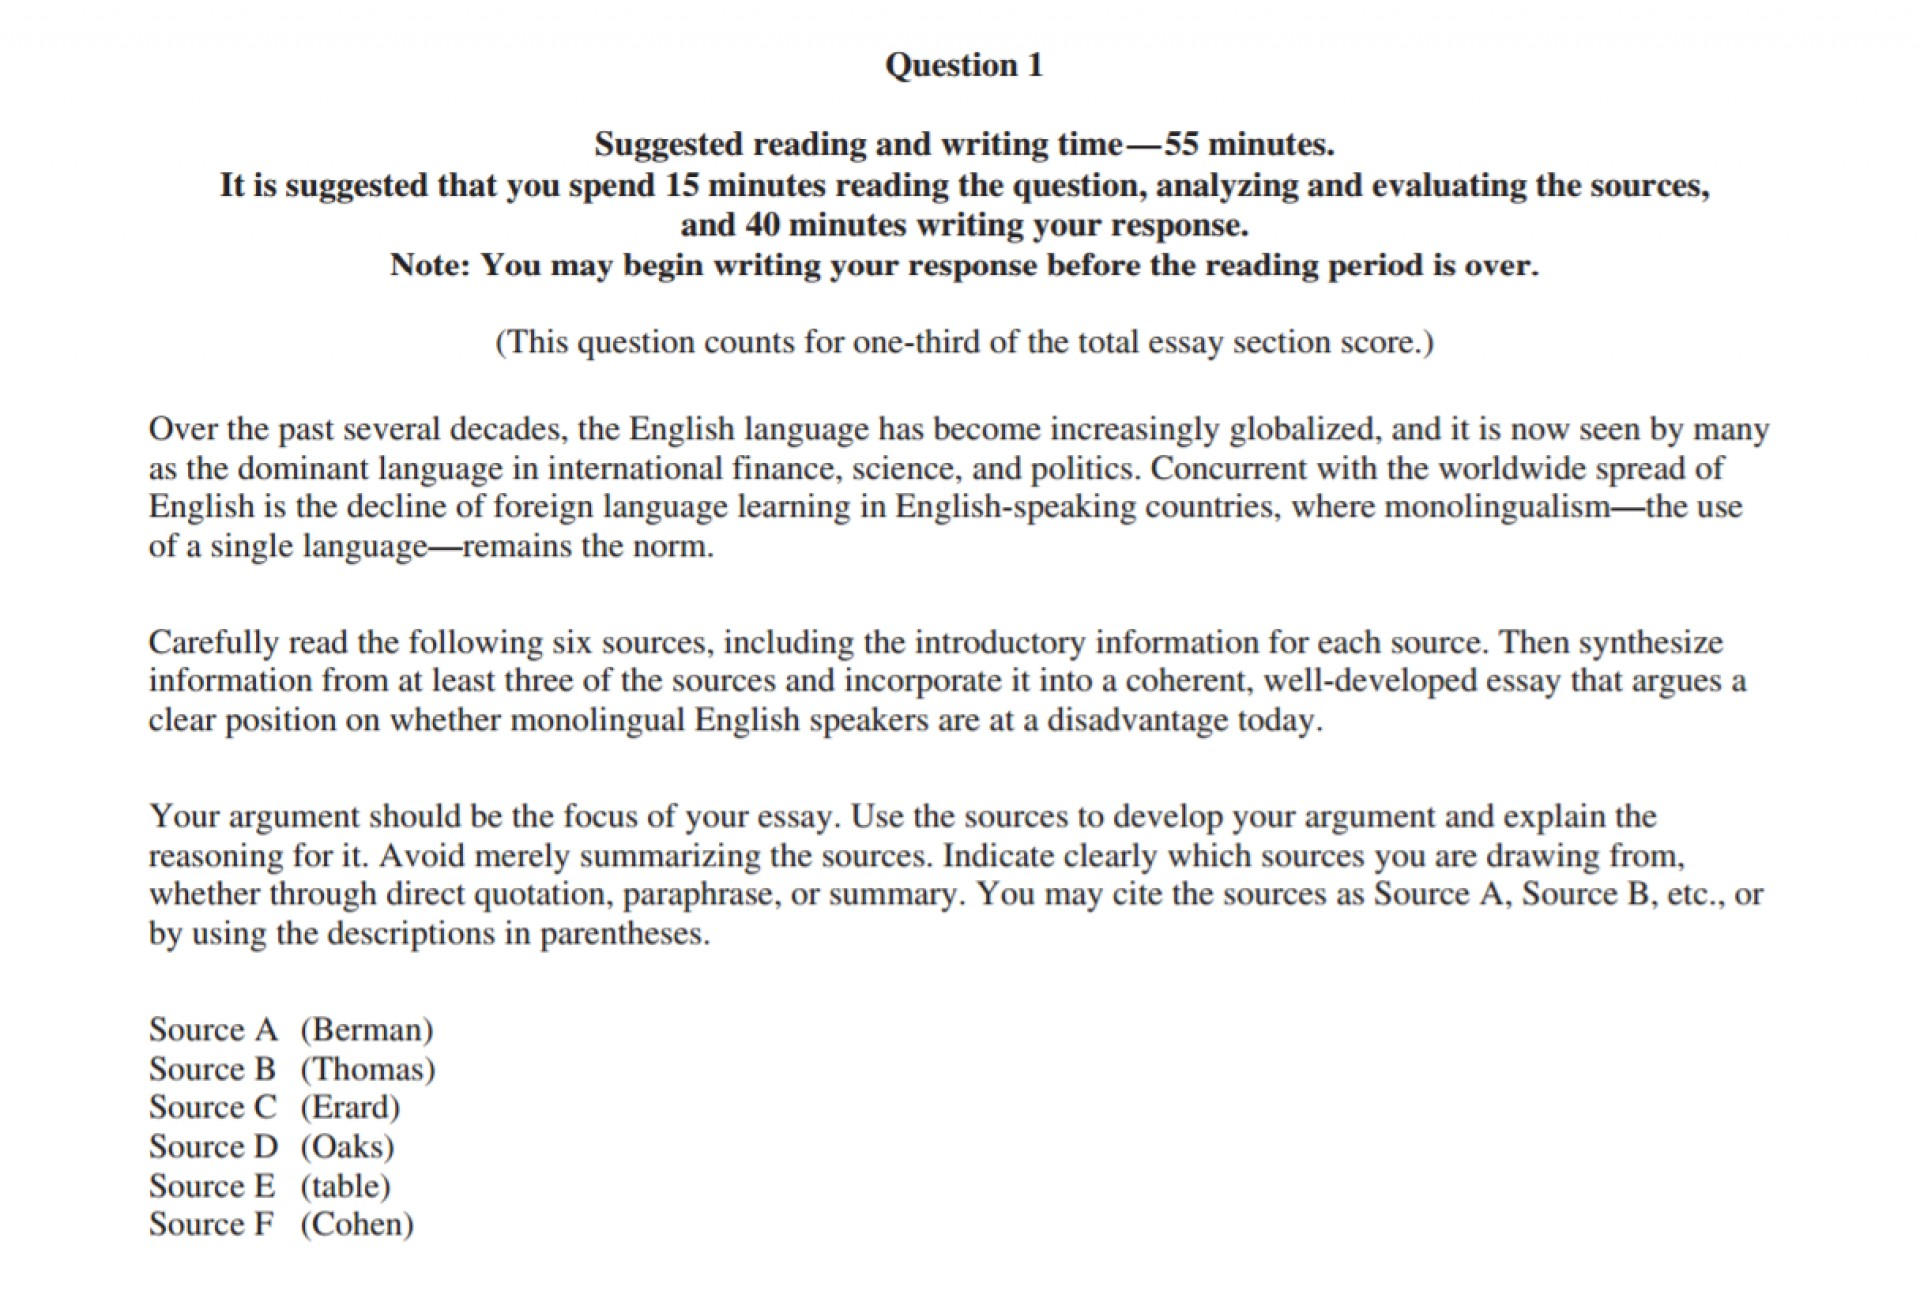 002 Ap English Argumentative Essay 8799170753 Lang Argument Awesome Prompts 2017 2014 1920